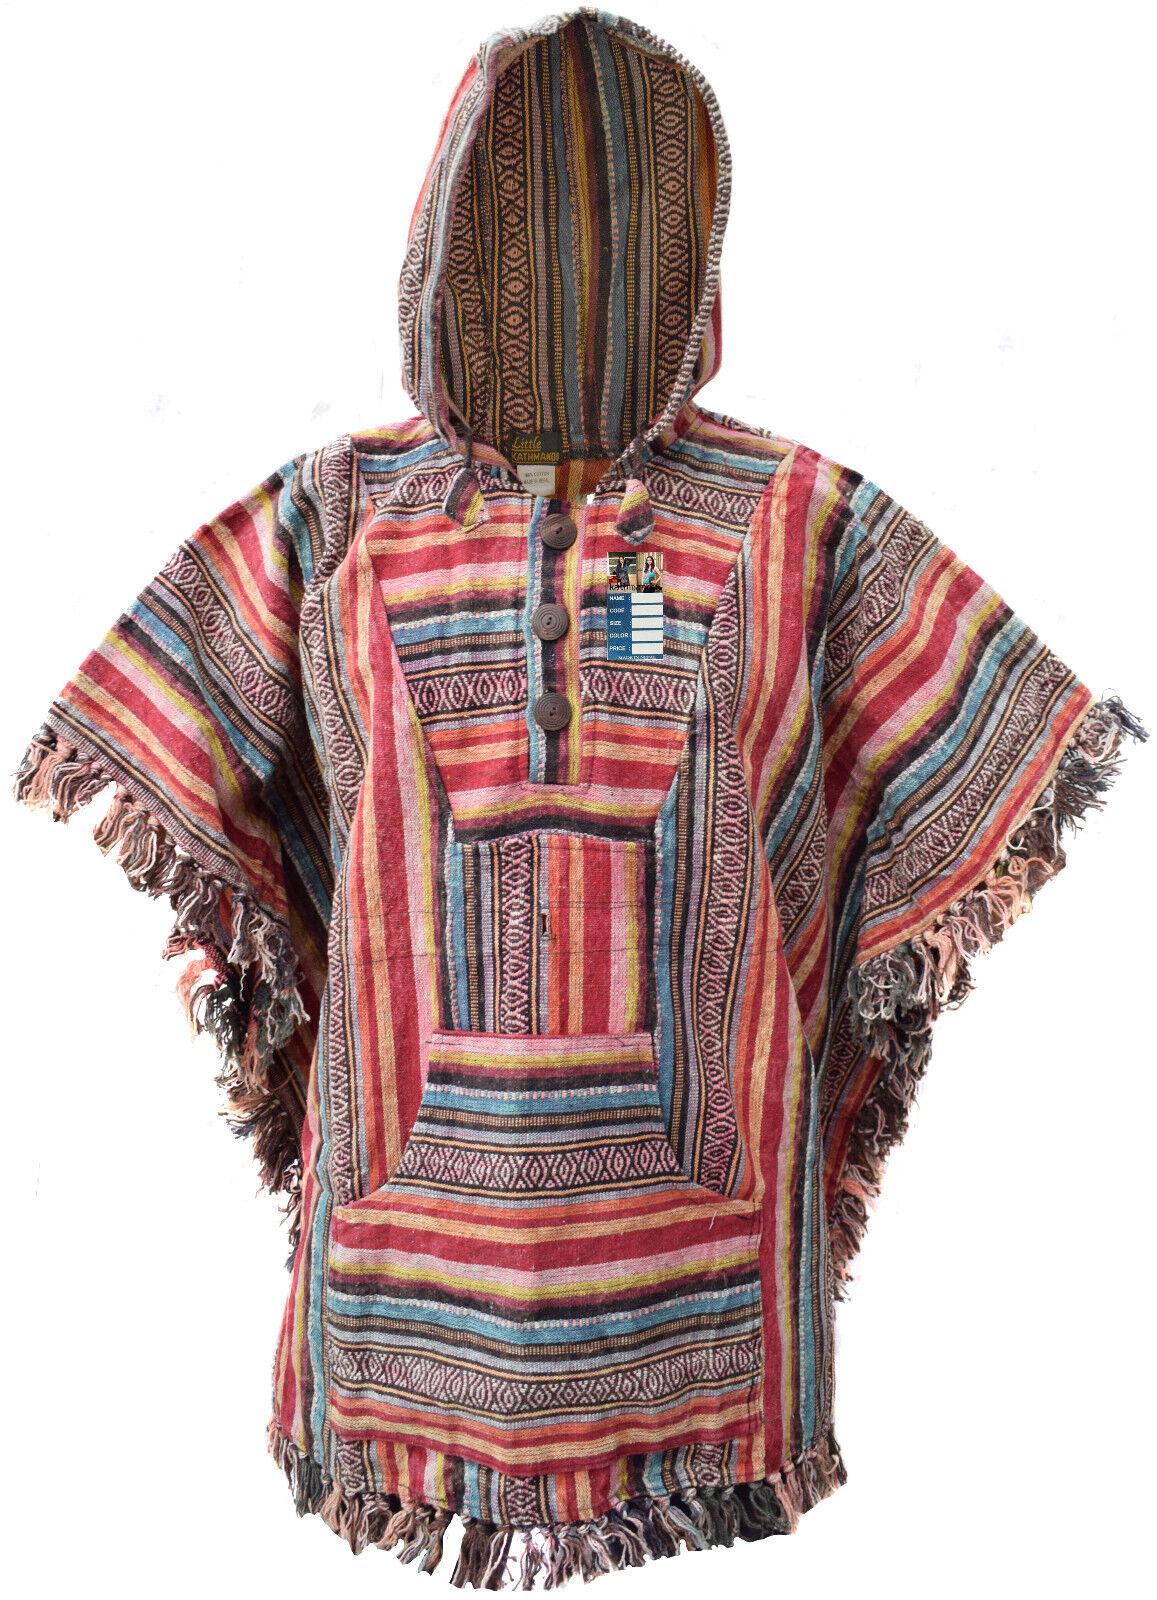 Algodón Gheri Individual Sarape Capa Capa Capa Hippy Gitano Abrigo Mantas Nepalí Poncho 5d6b7a